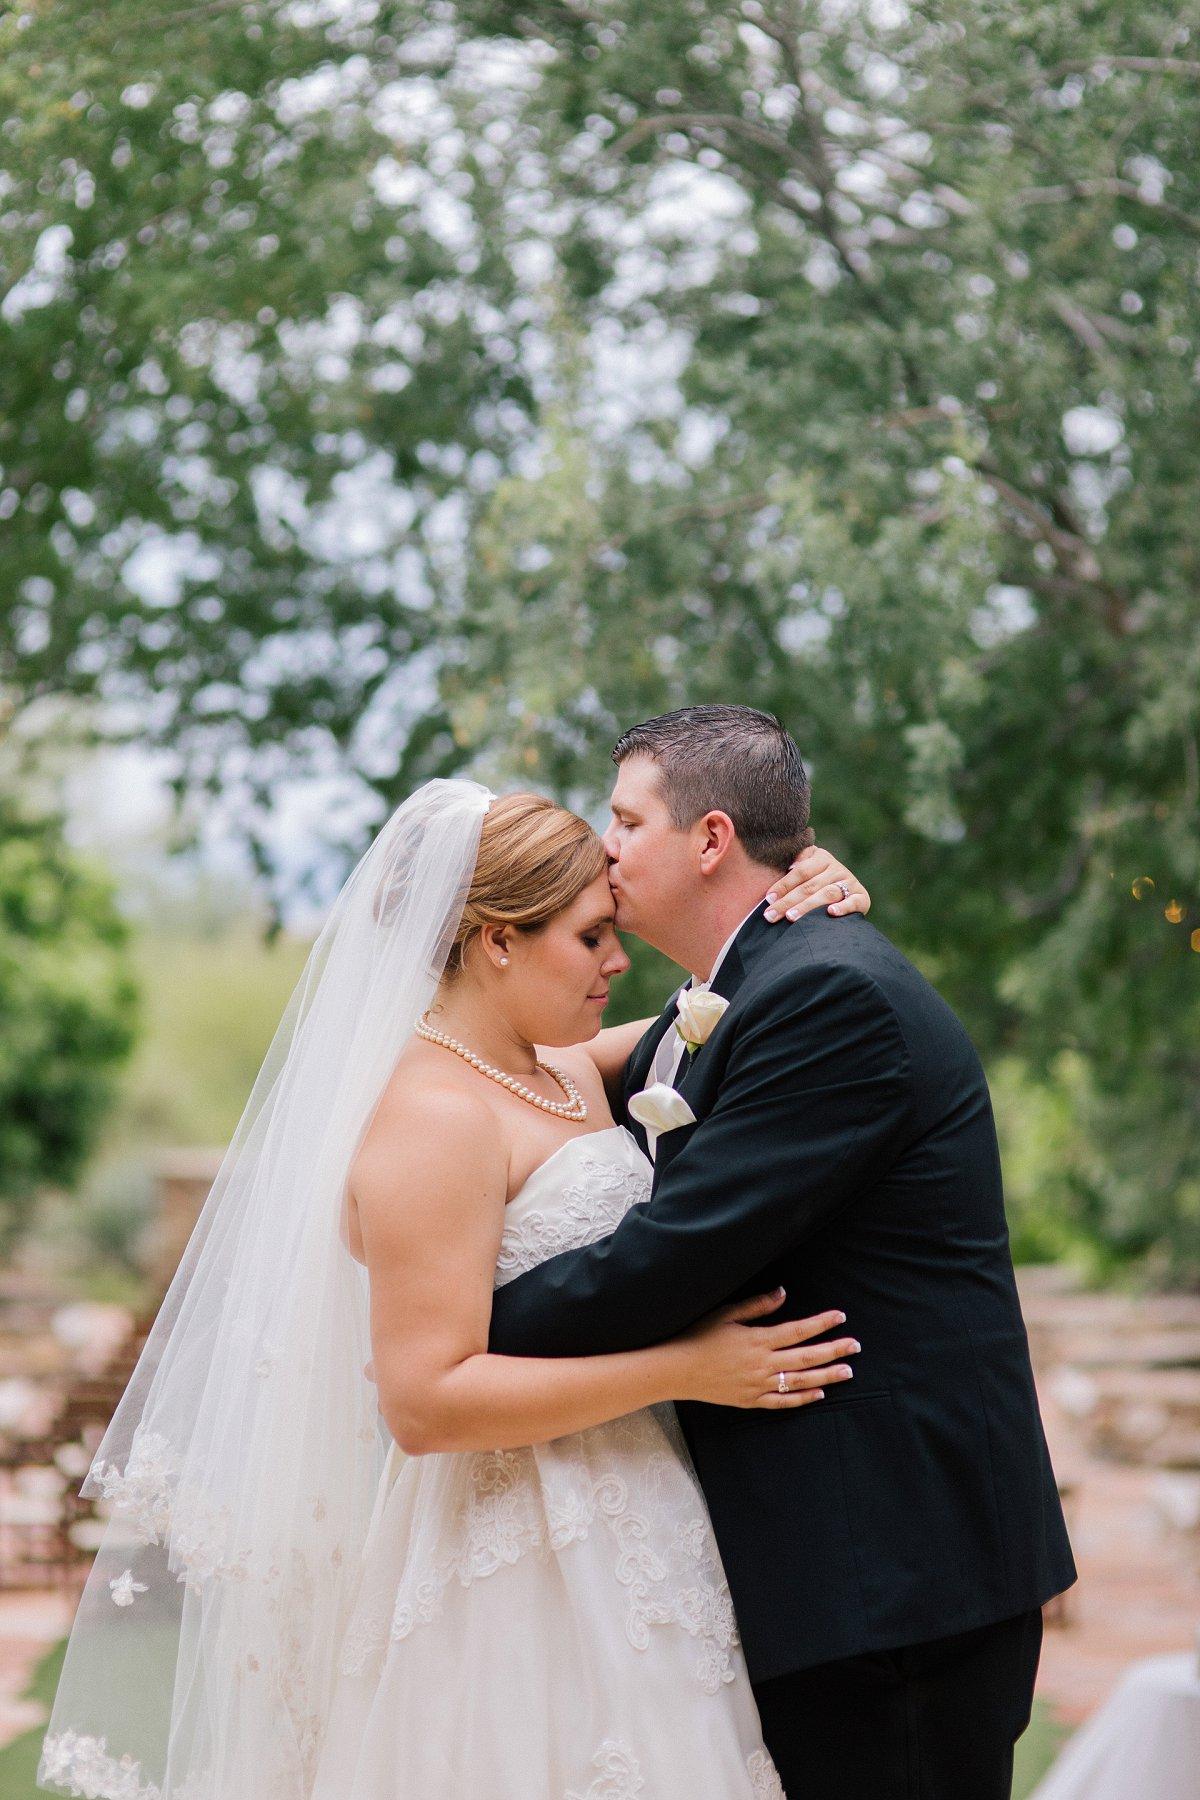 Sassi wedding photographer